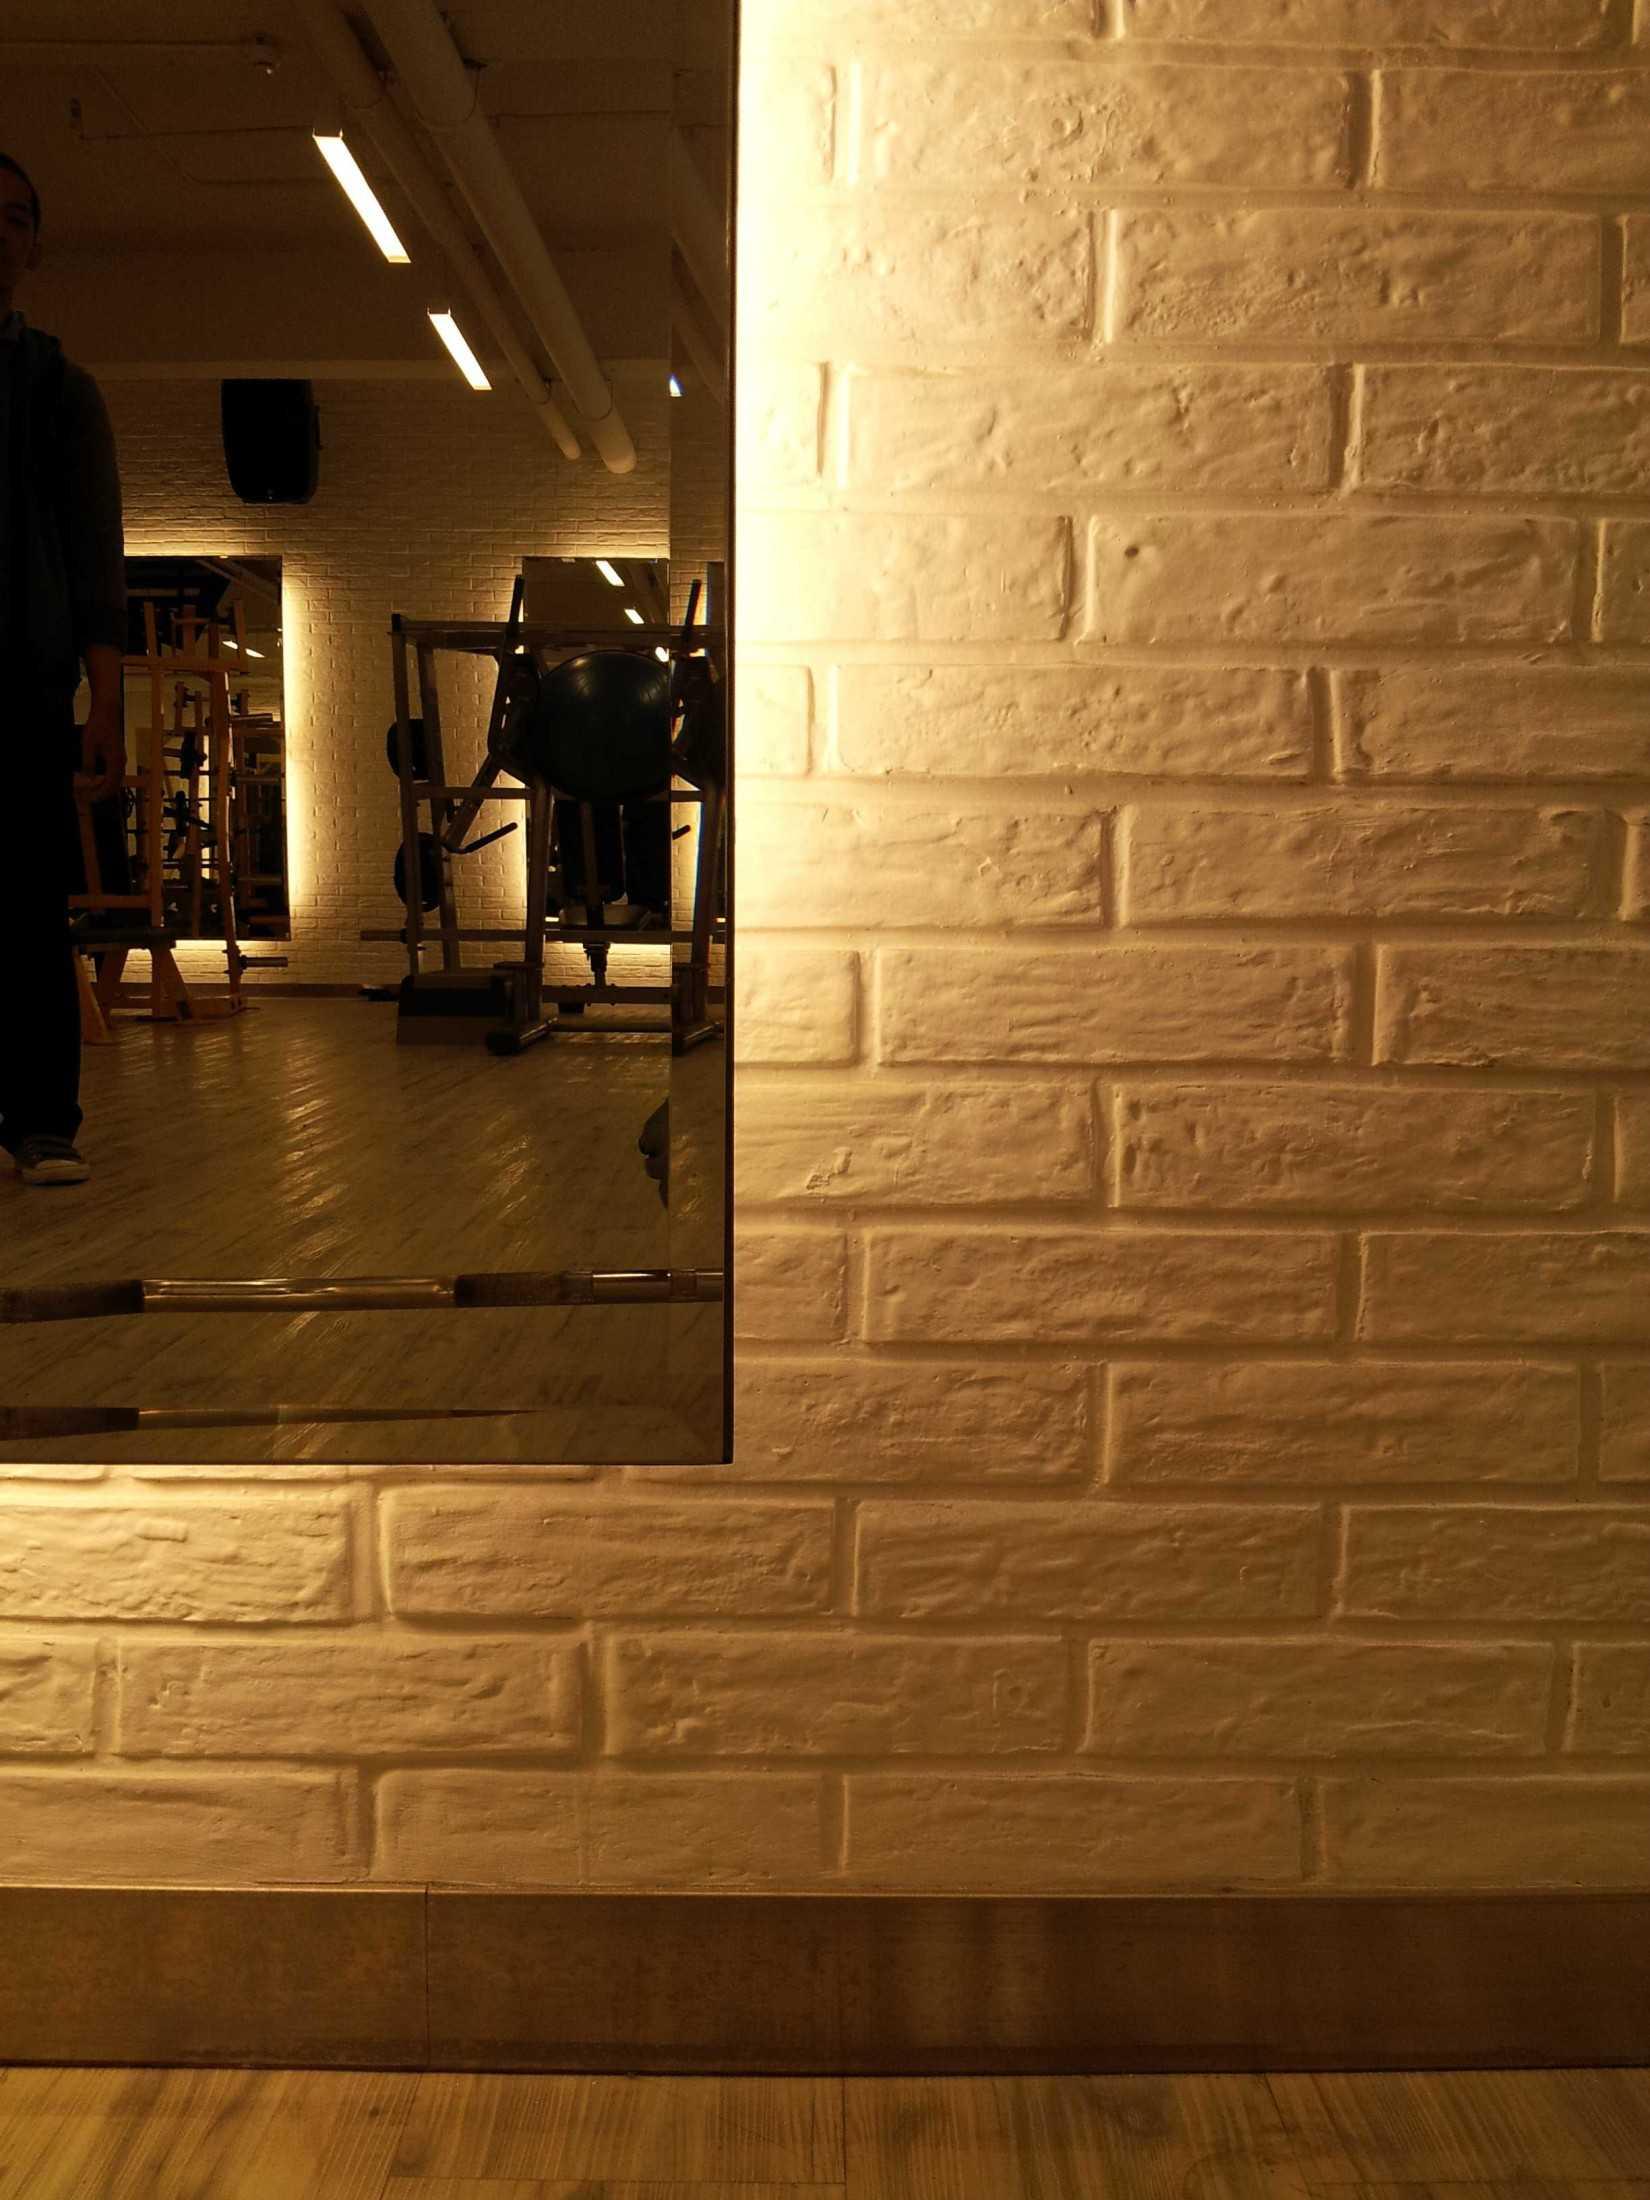 Astana Interior Gold's Gym  Jl. Arteri S. Parman, Jelambar Baru, Grogol Petamburan, Rt.11/rw.1, Tj. Duren Utara, Grogol Petamburan, Kota Jakarta Barat, Daerah Khusus Ibukota Jakarta 11470, Indonesia Jl. Arteri S. Parman, Jelambar Baru, Grogol Petamburan, Rt.11/rw.1, Tj. Duren Utara, Grogol Petamburan, Kota Jakarta Barat, Daerah Khusus Ibukota Jakarta 11470, Indonesia Astana-Interior-Golds-Gym-  58086